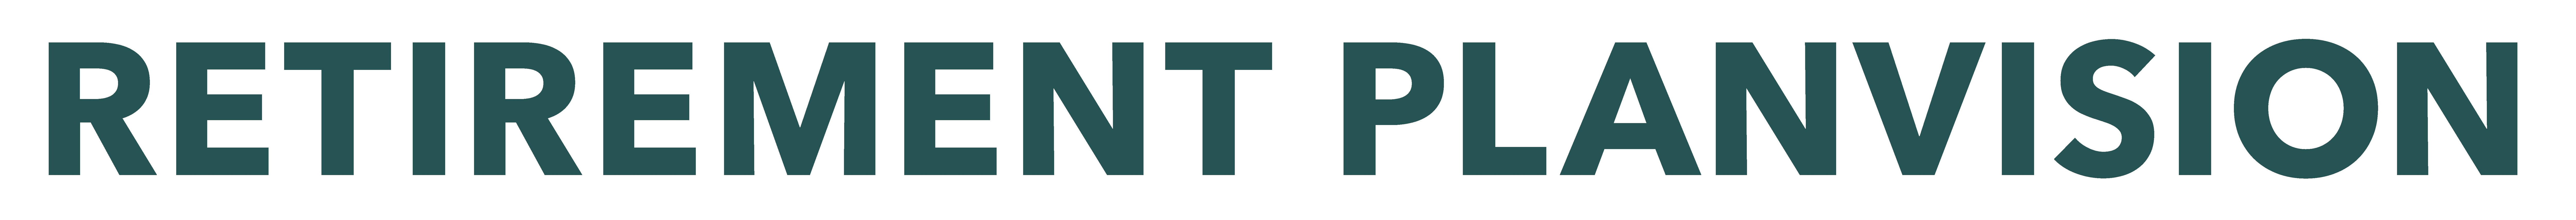 RetirementPlanVision_Logo